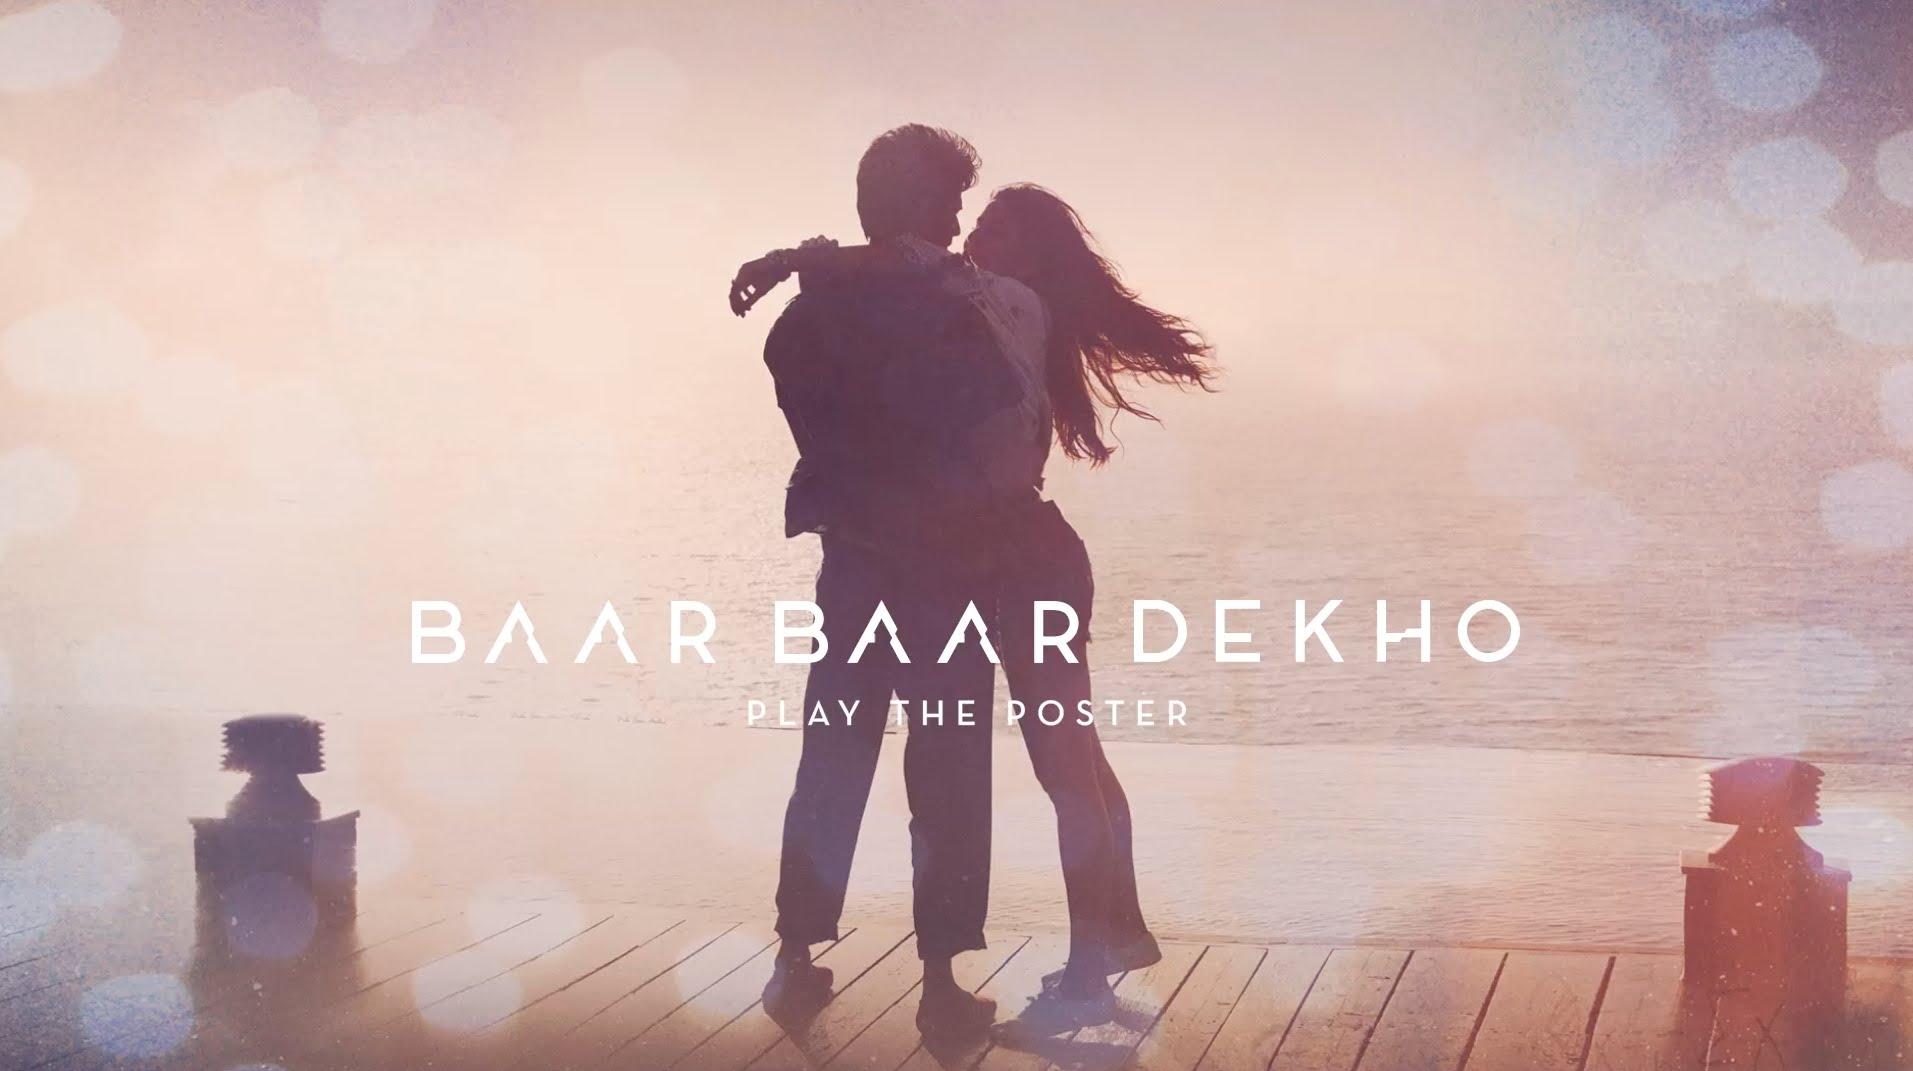 Baar Baar Dekho Motion Poster is quite interesting, trailer will be out tomorrow